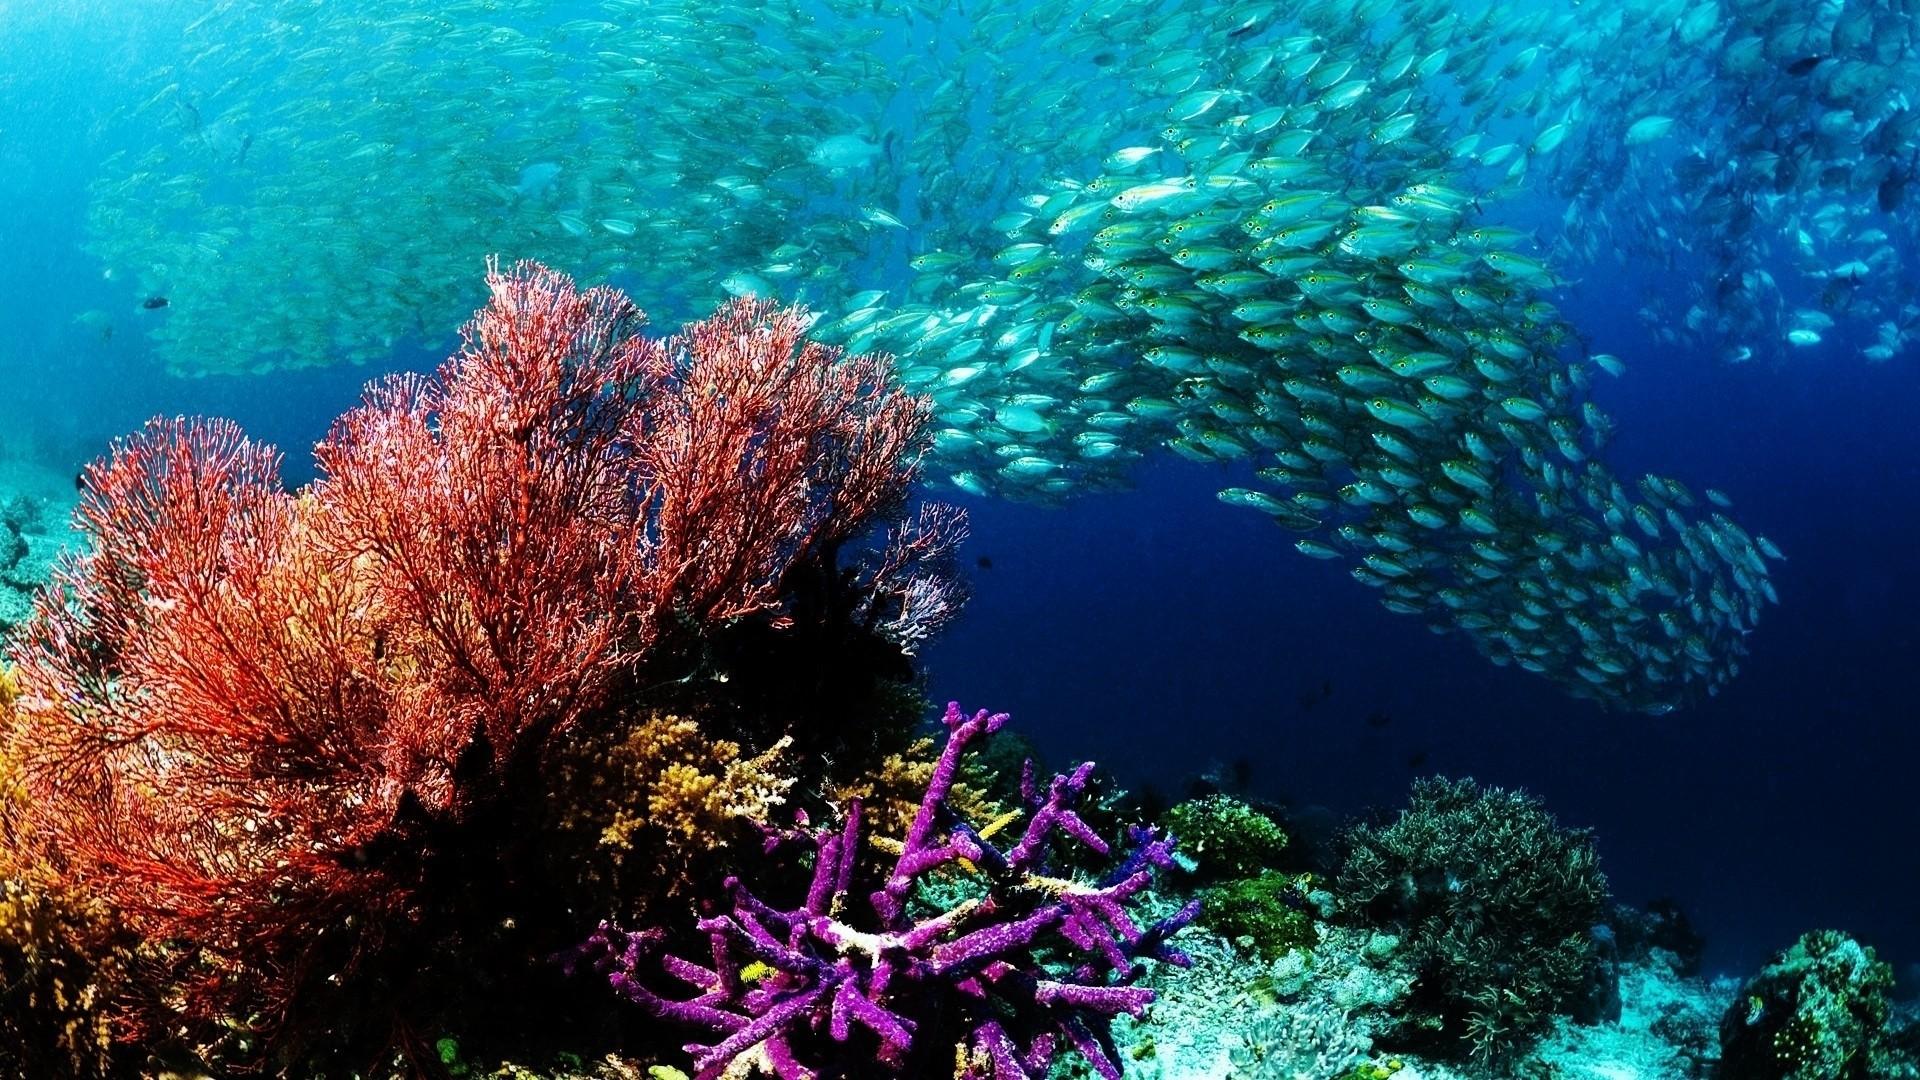 Fish hd wallpaper download